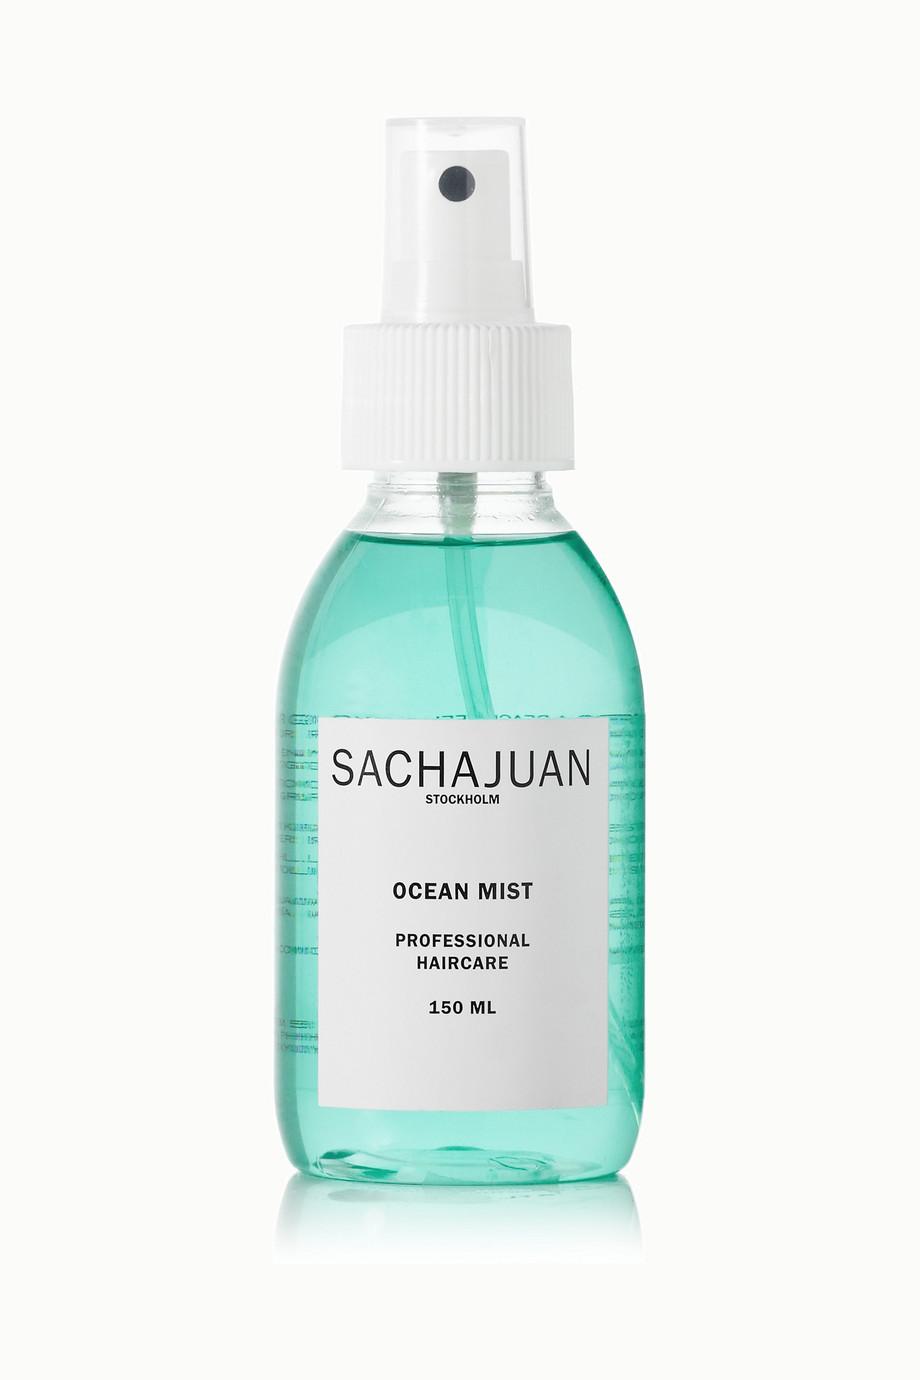 SACHAJUAN Ocean Mist Texturizing Spray, 150ml